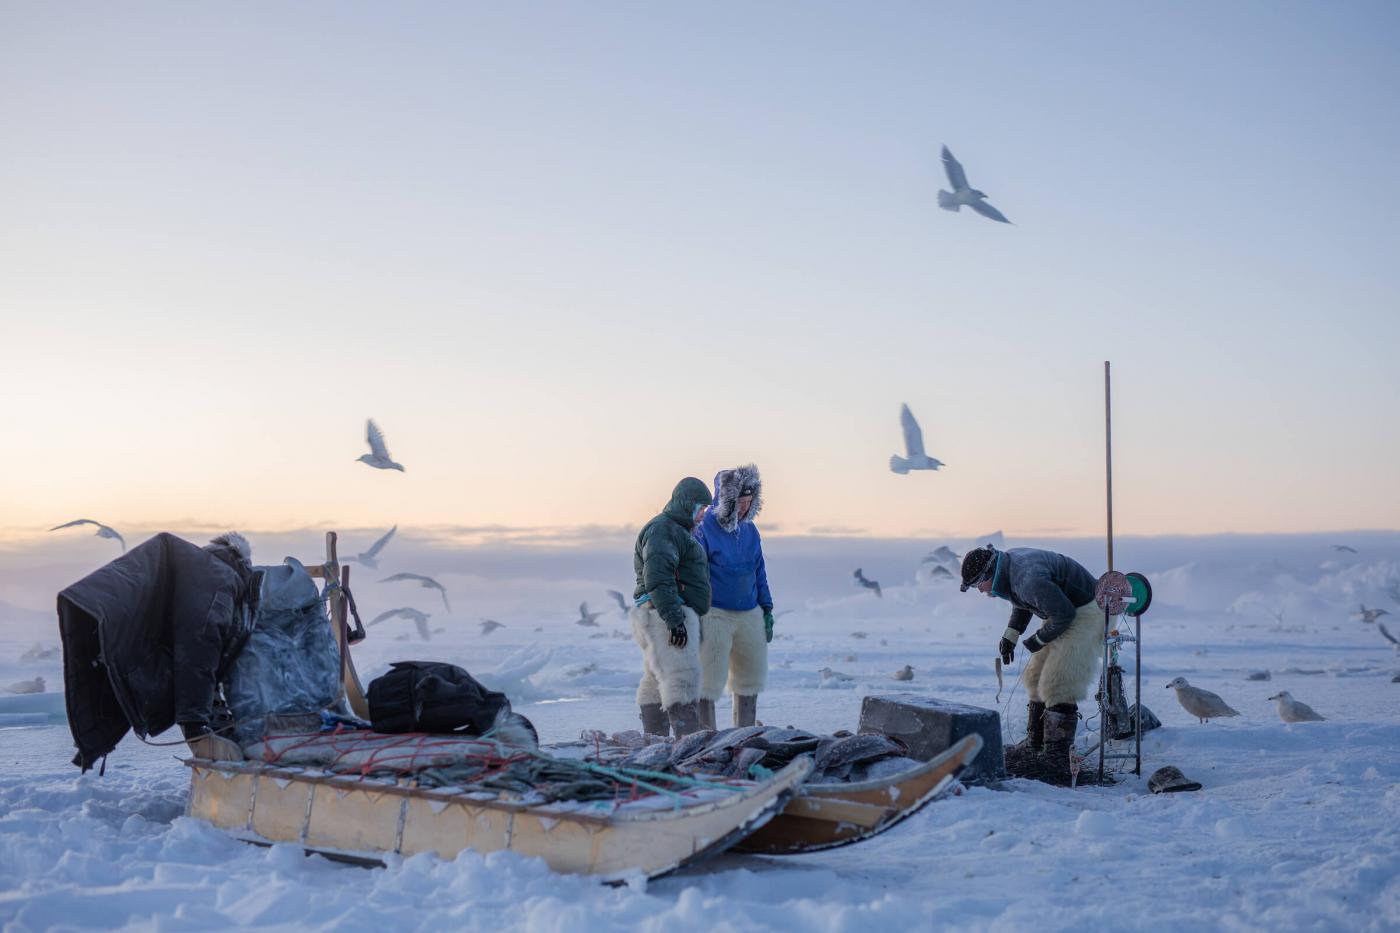 Fishing spot in Ilulissat icefjord. Photo - Aningaaq R. Carlsen, Visit Greenland